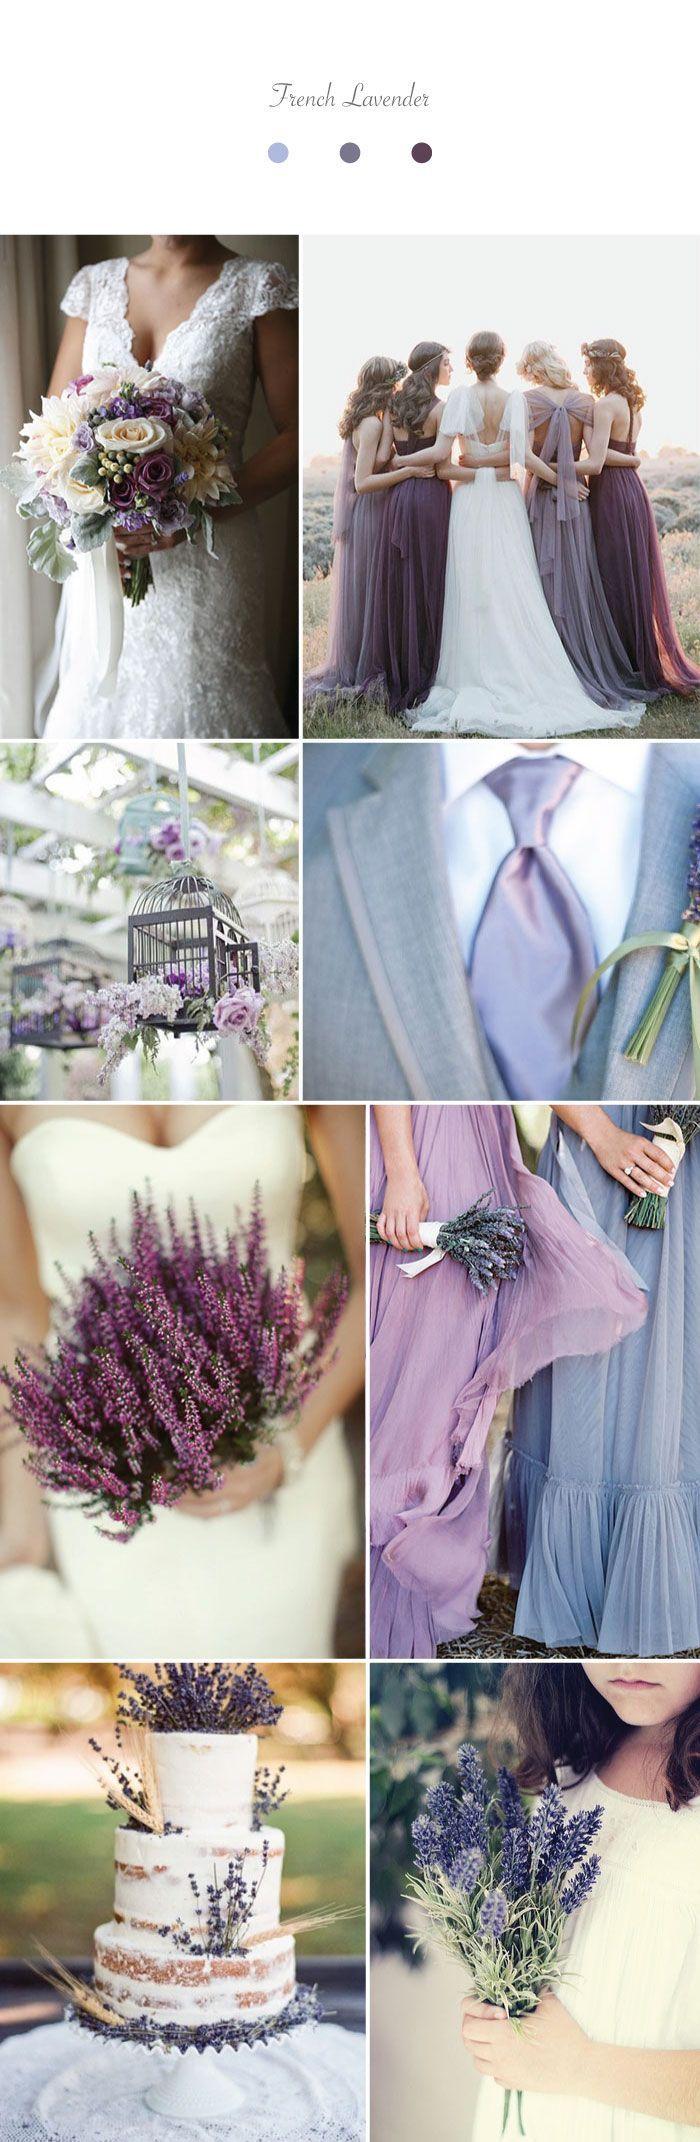 Wedding Inspiration for French Lavender